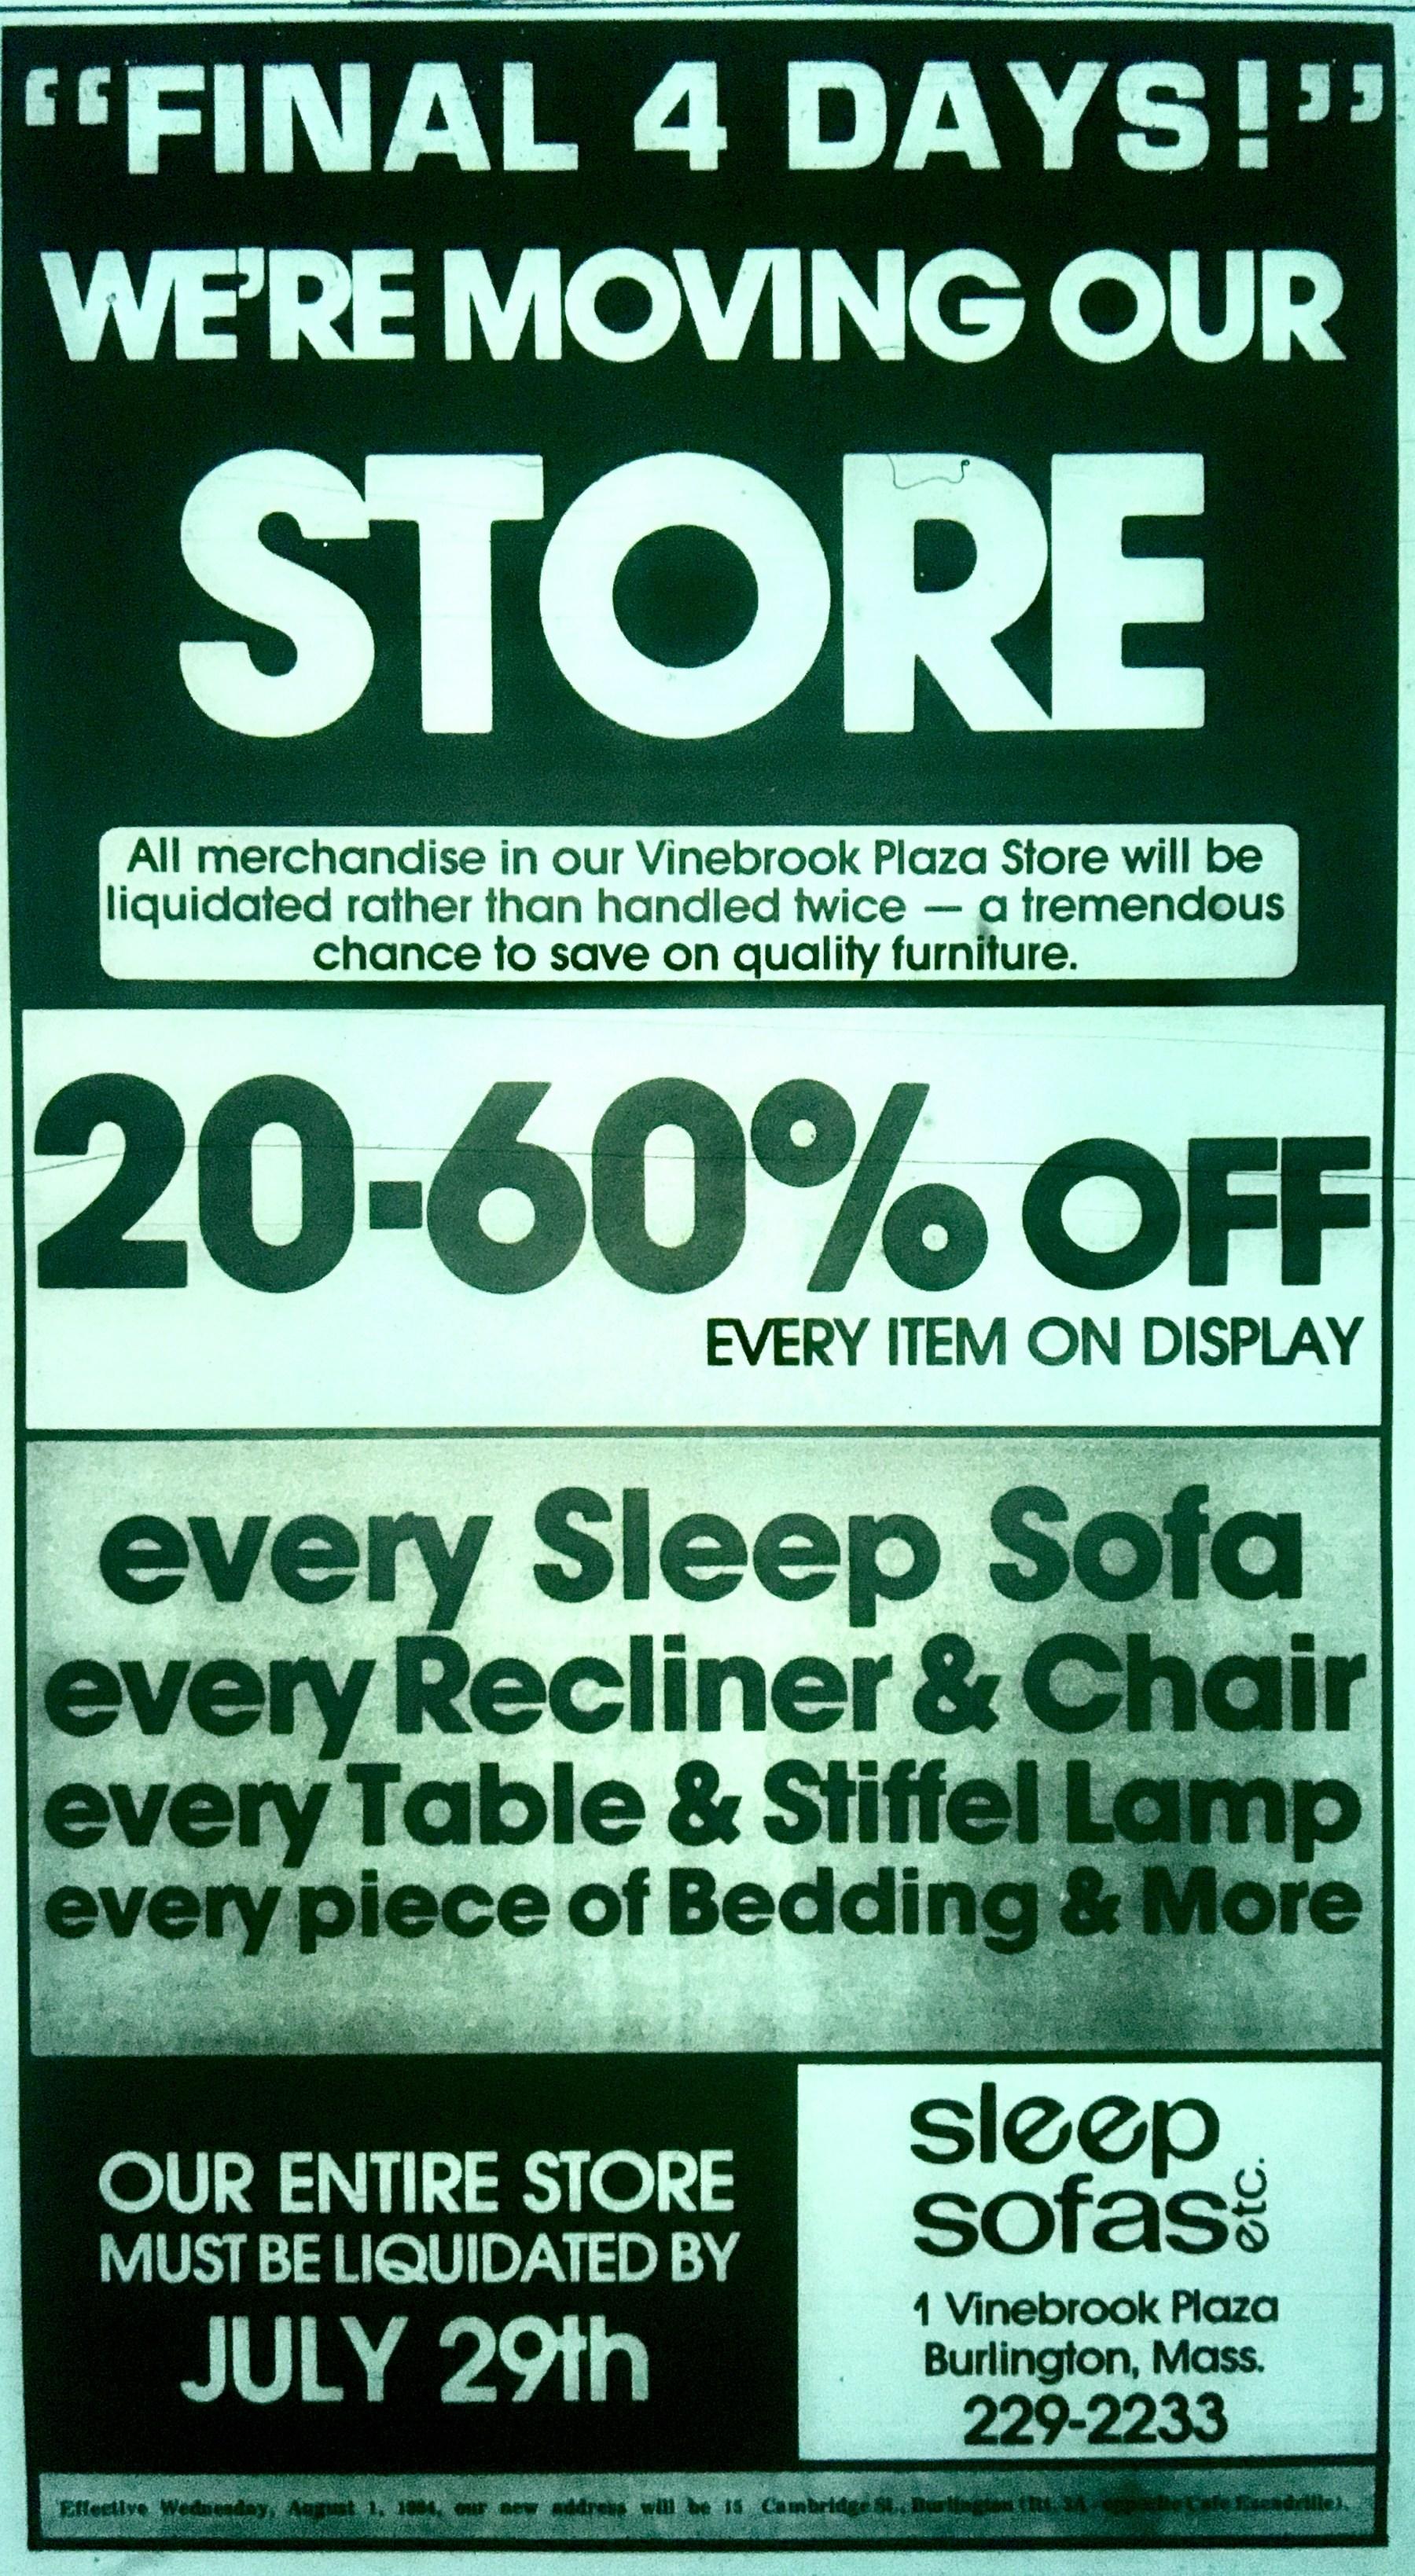 Sleep Sofas Etc., Burlington MA